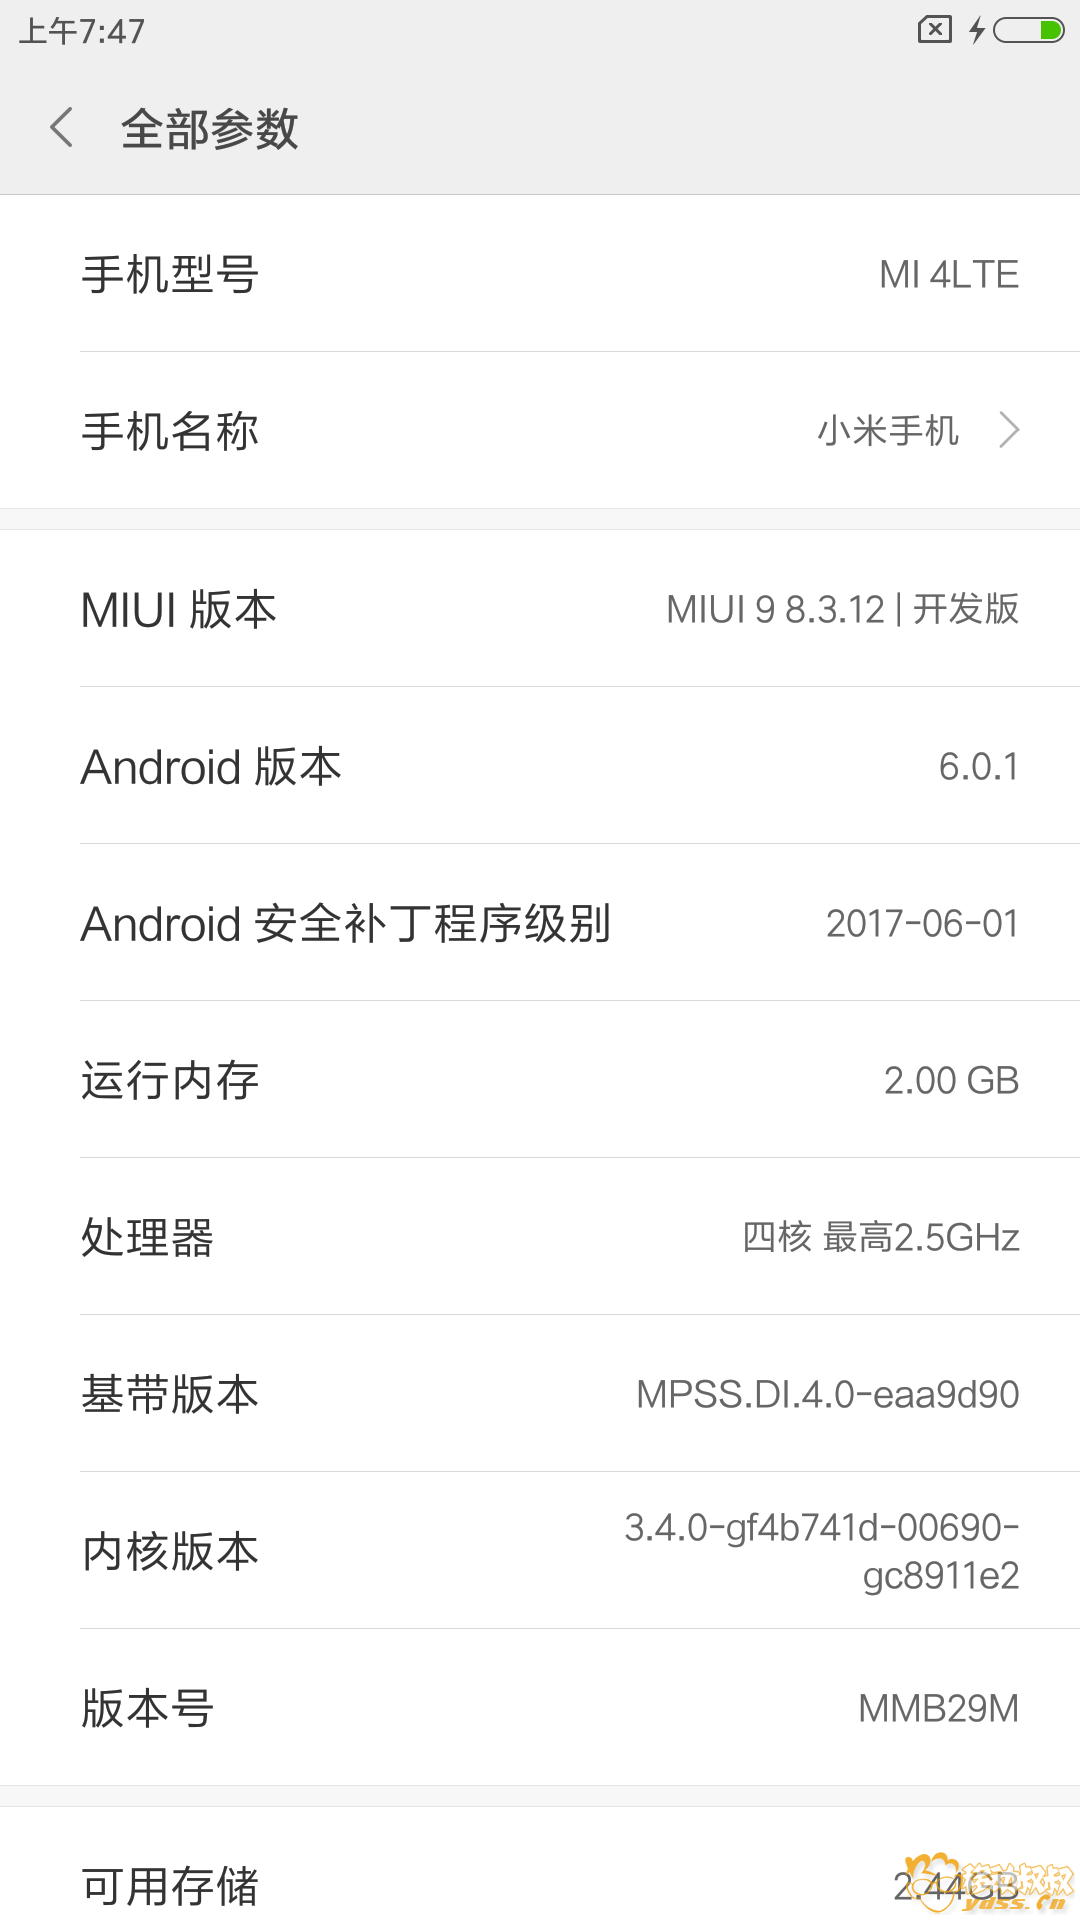 Screenshot_2018-03-13-07-47-42-318_com.android.settings.png